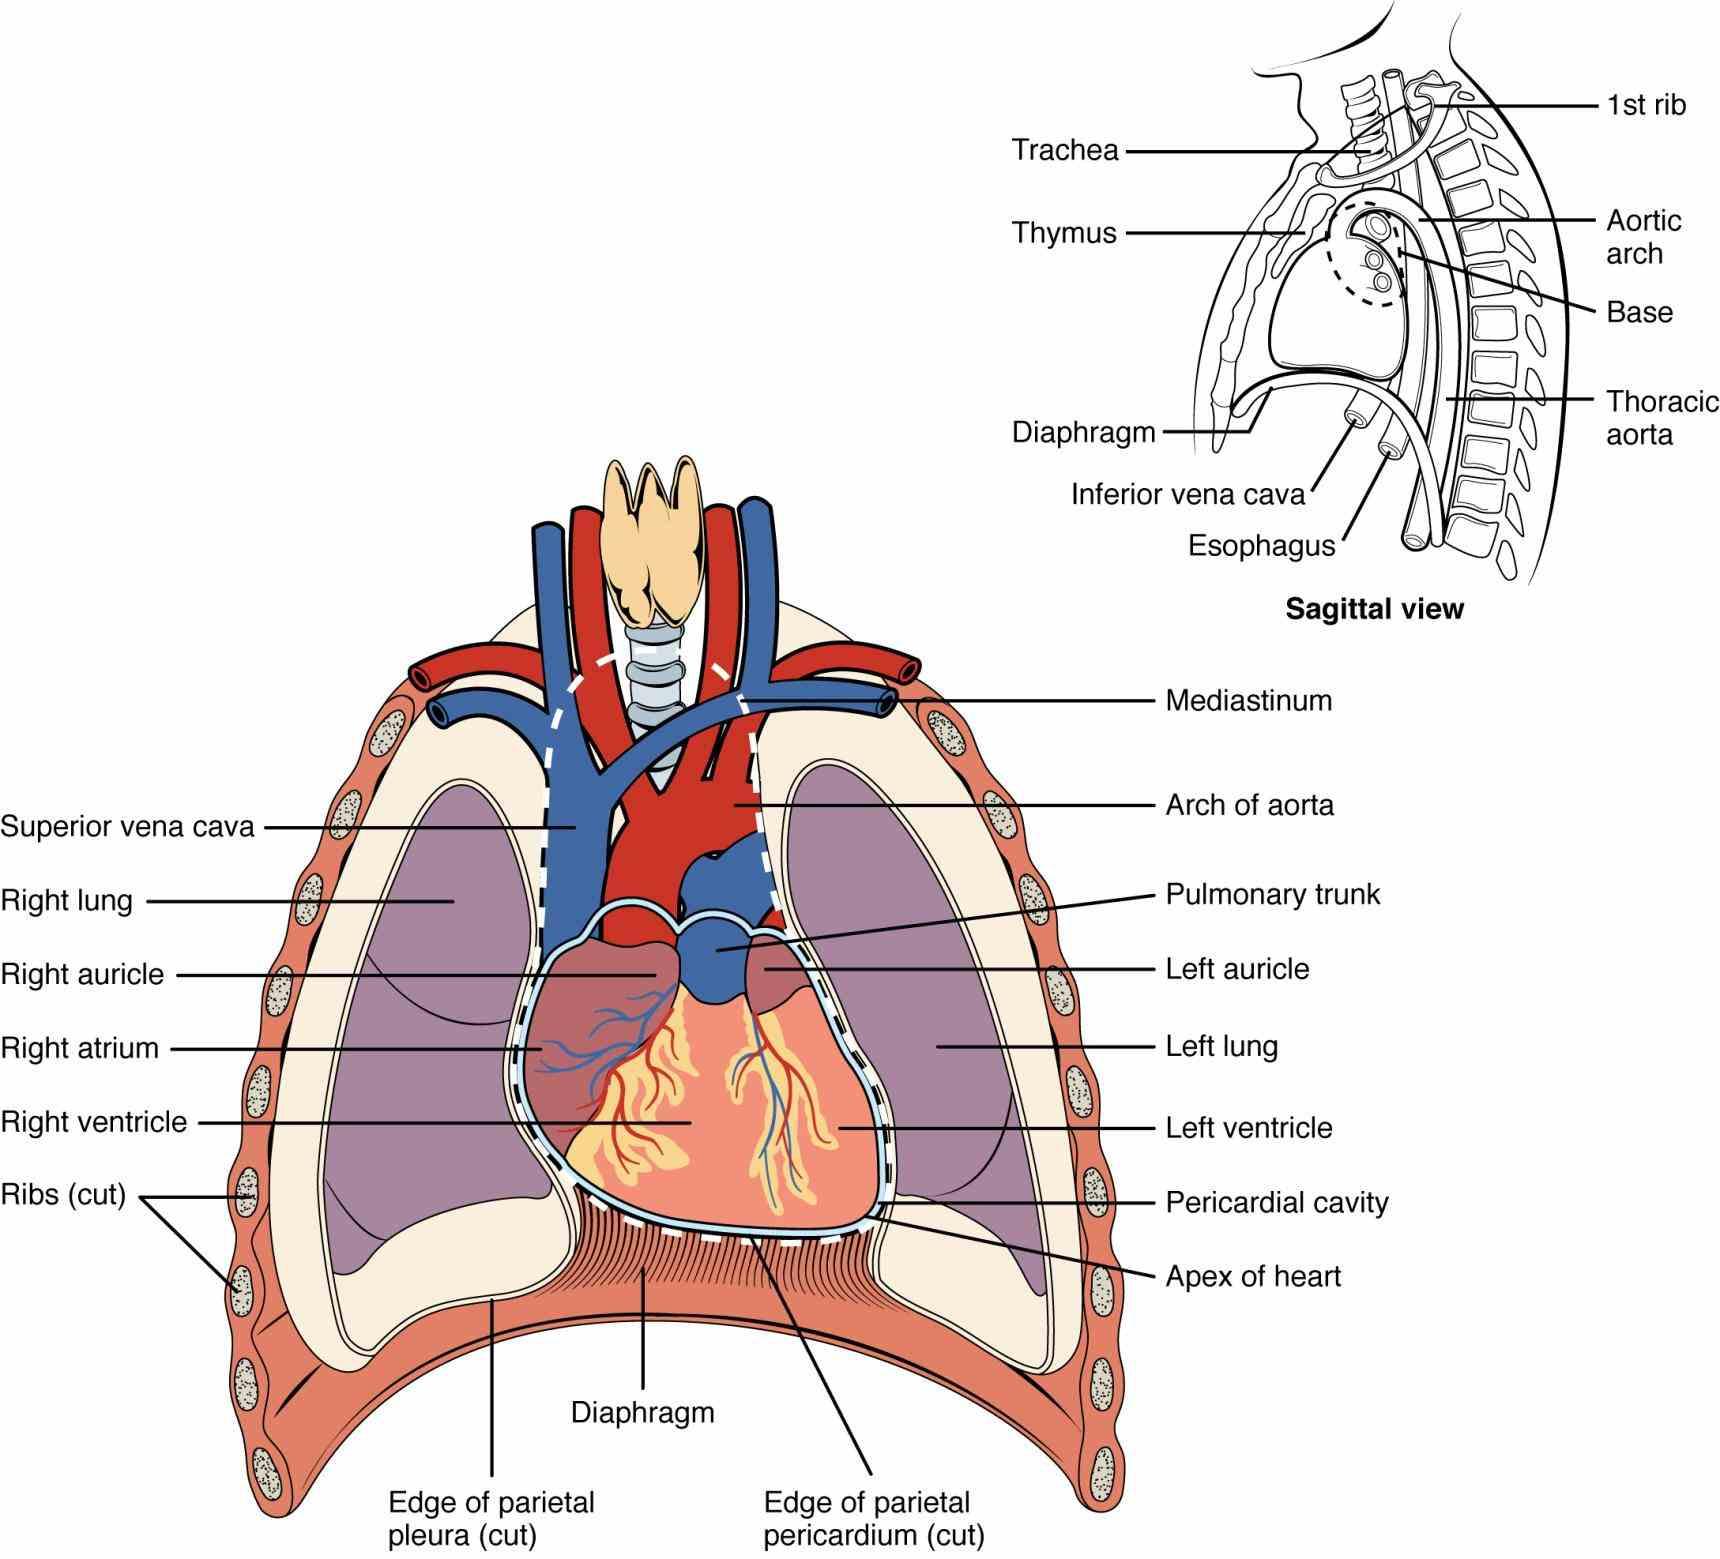 photo layered de Double Layered Membrane Around The Heart mar title double layered membrane around heart anatomy – openstax